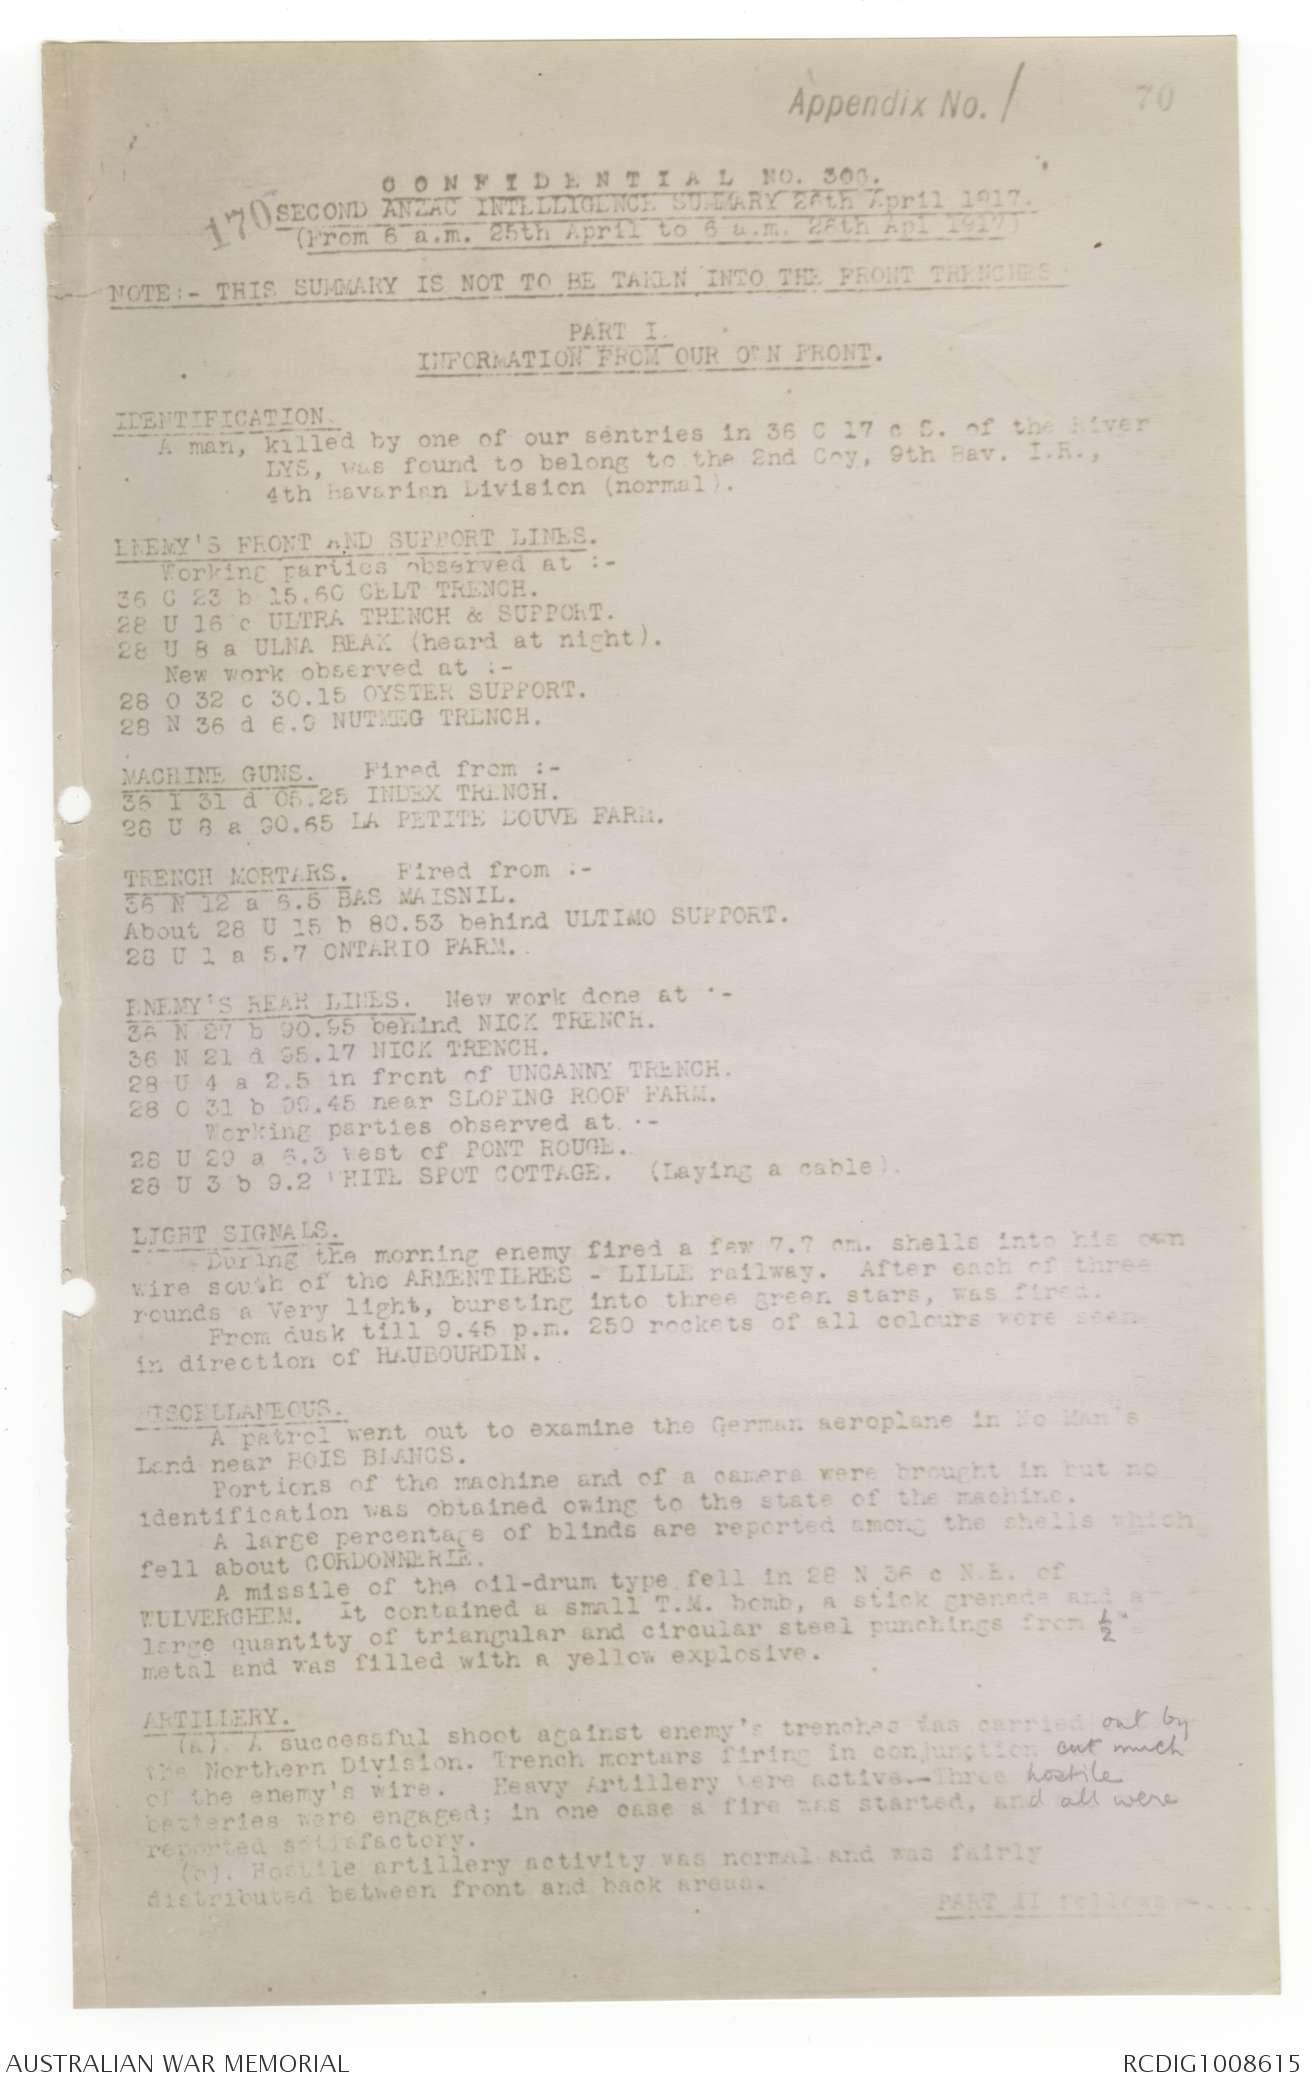 AWM4 1/33/12 PART 2 - April 1917 | The Australian War Memorial